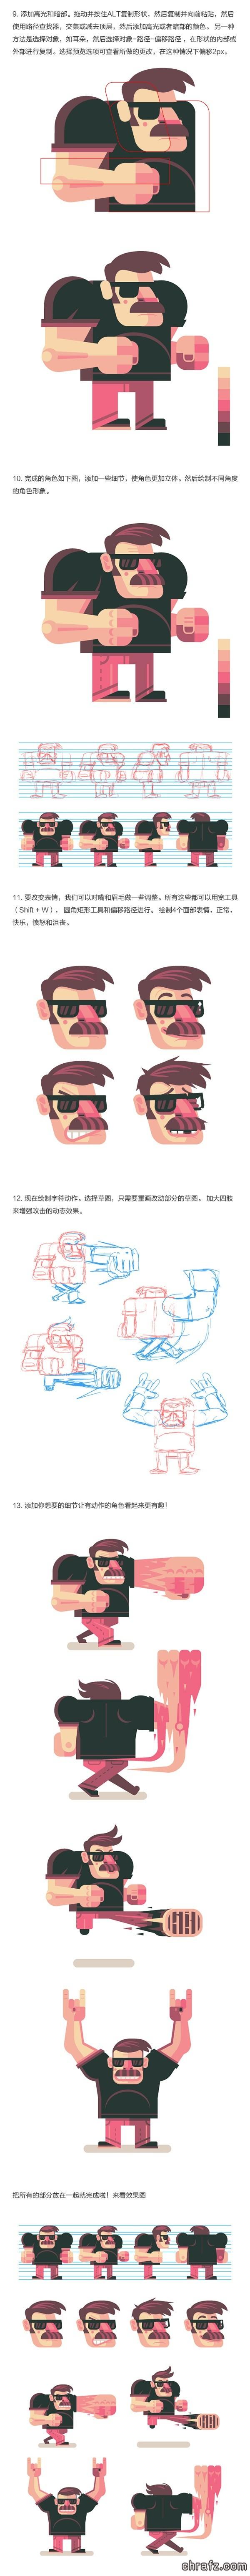 chrafz教你创建一组炫酷的动作游戏角色-AI设计教程